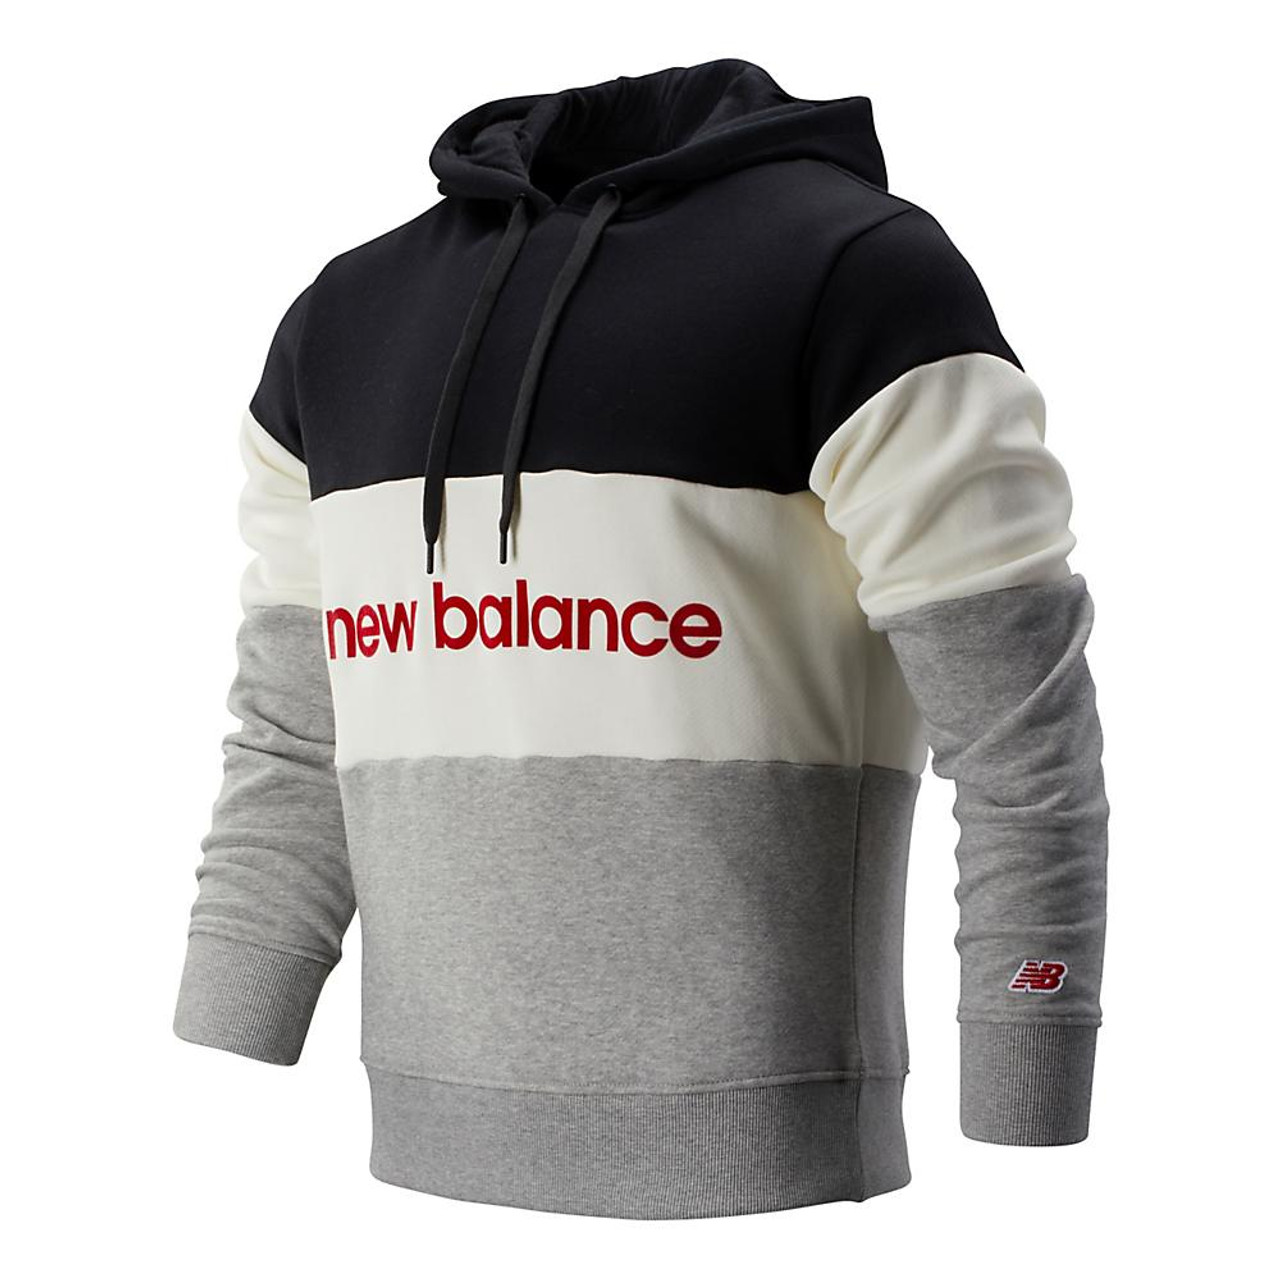 new balance athletics